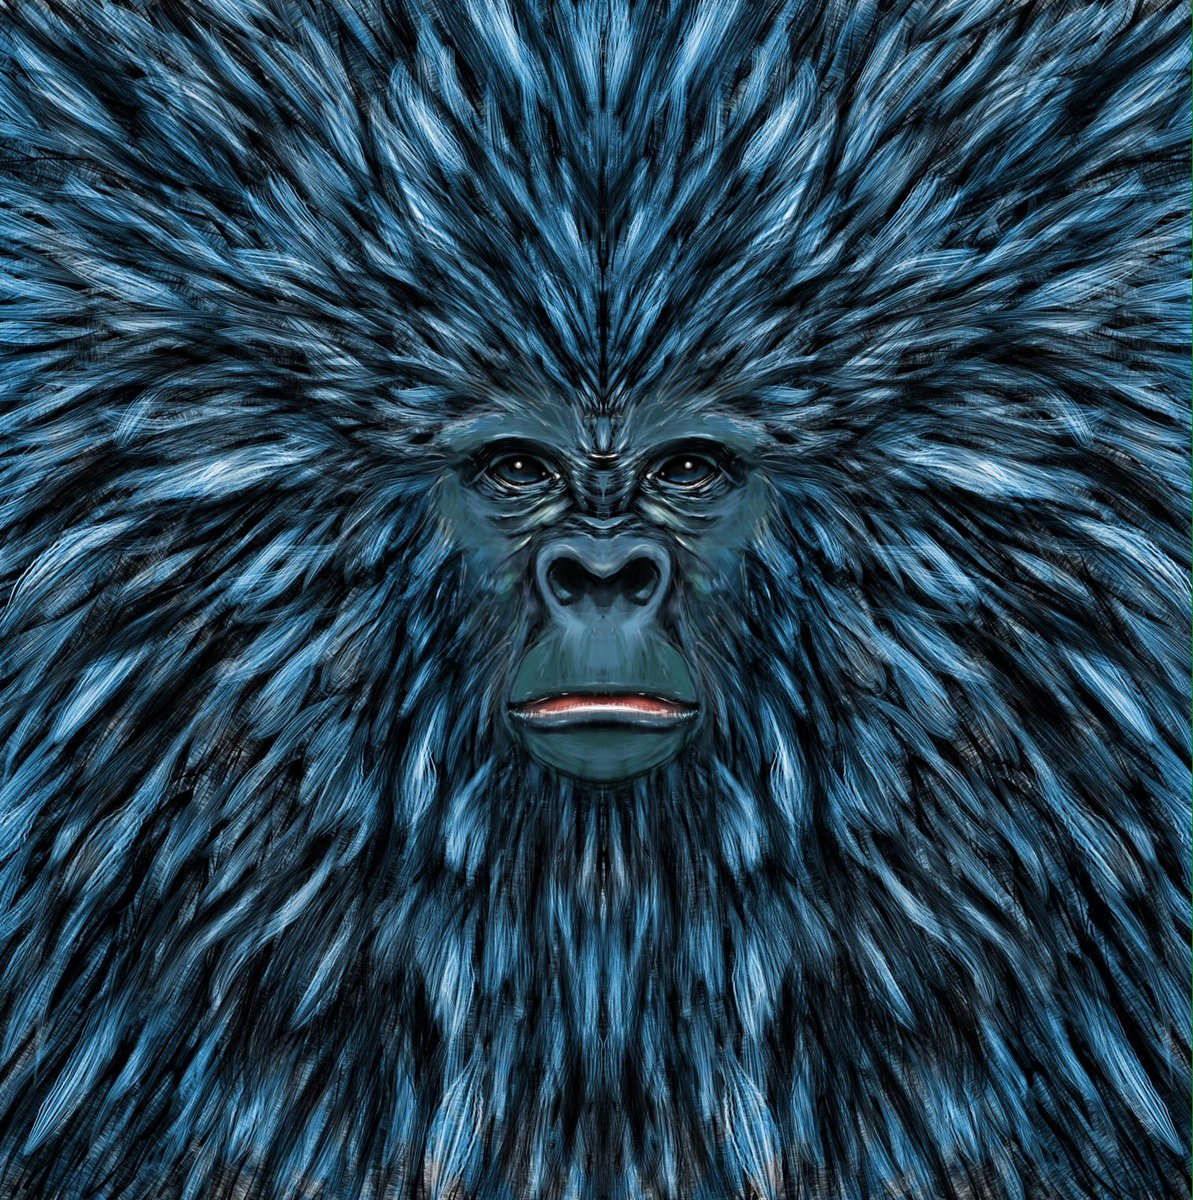 Soon available in shops! Link in BIO.  #ape #drawing #art #redbubble #digitalart #digitalpainting #society6<br>http://pic.twitter.com/HM9PUshYZg